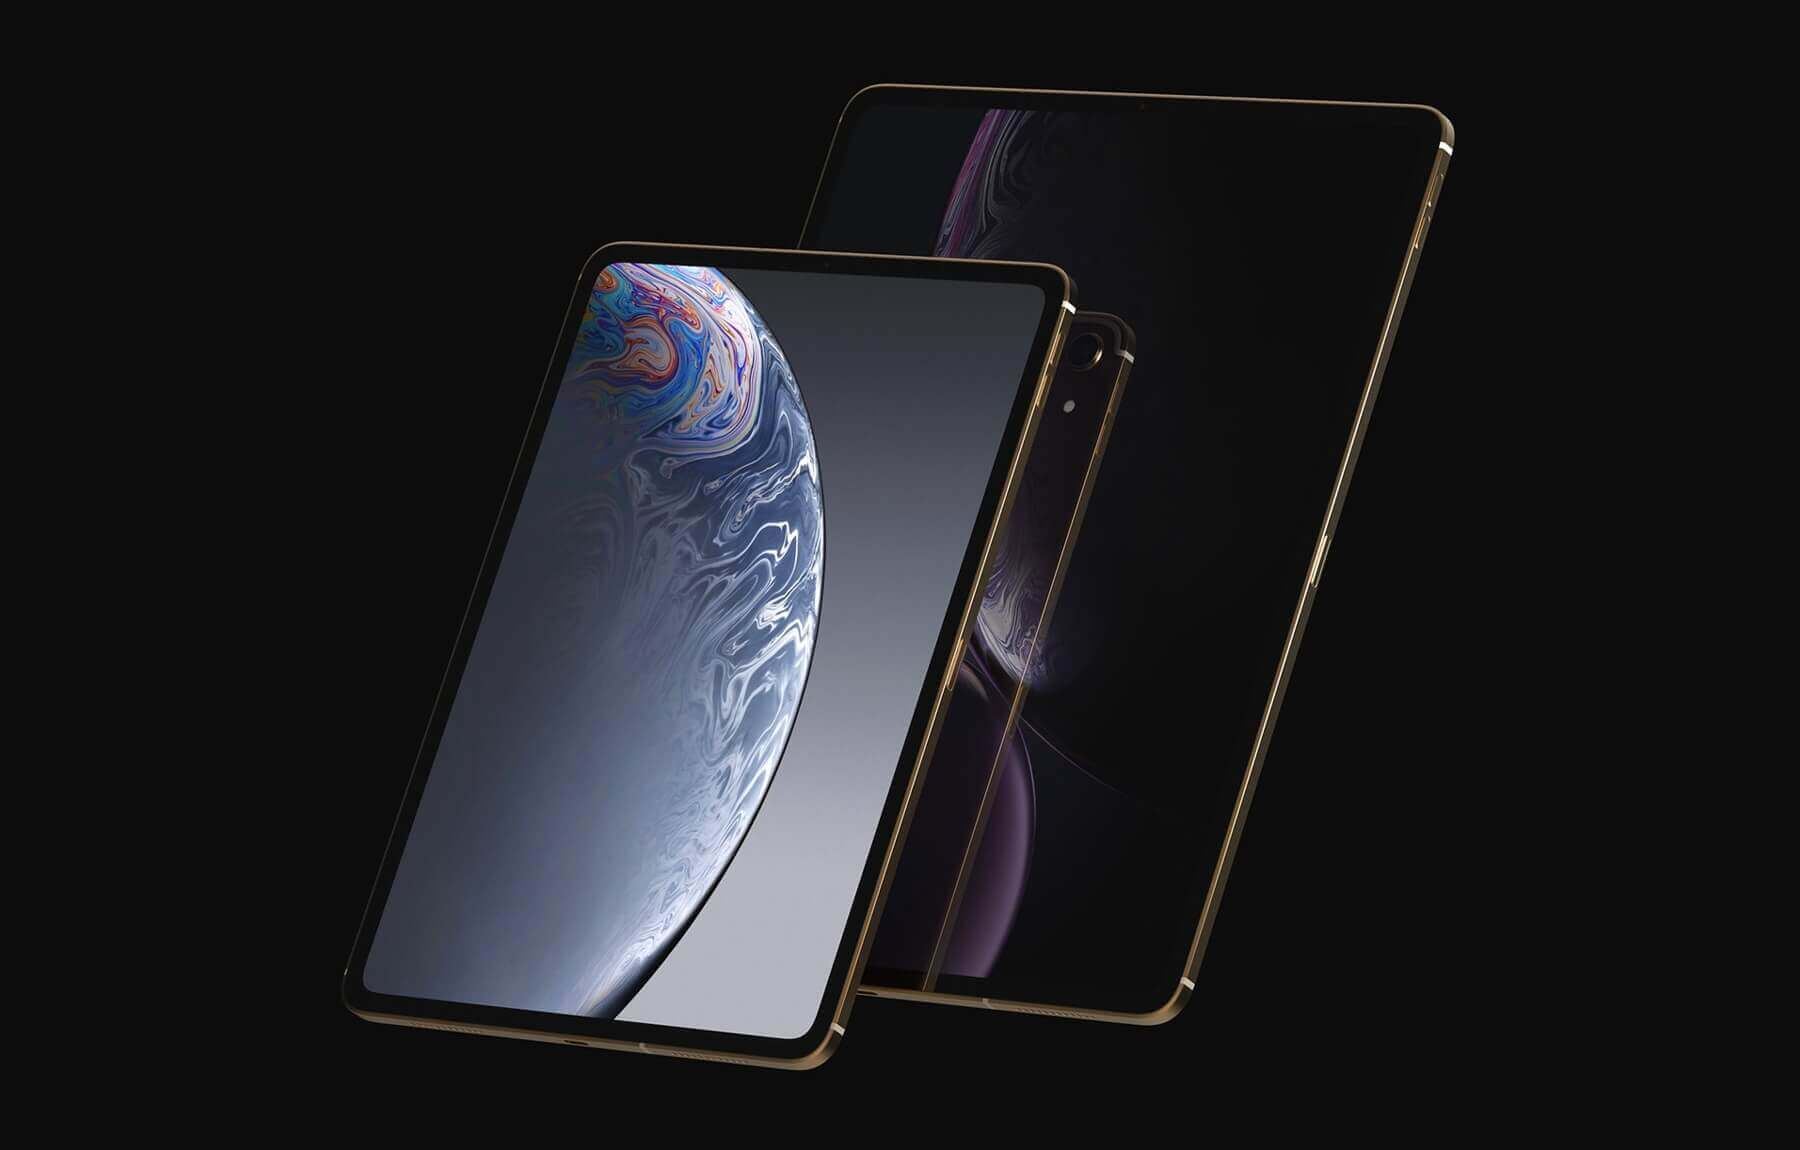 Apple нарастила оперативку некоторых модификаций iPad Pro 2018 до 6 ГБ